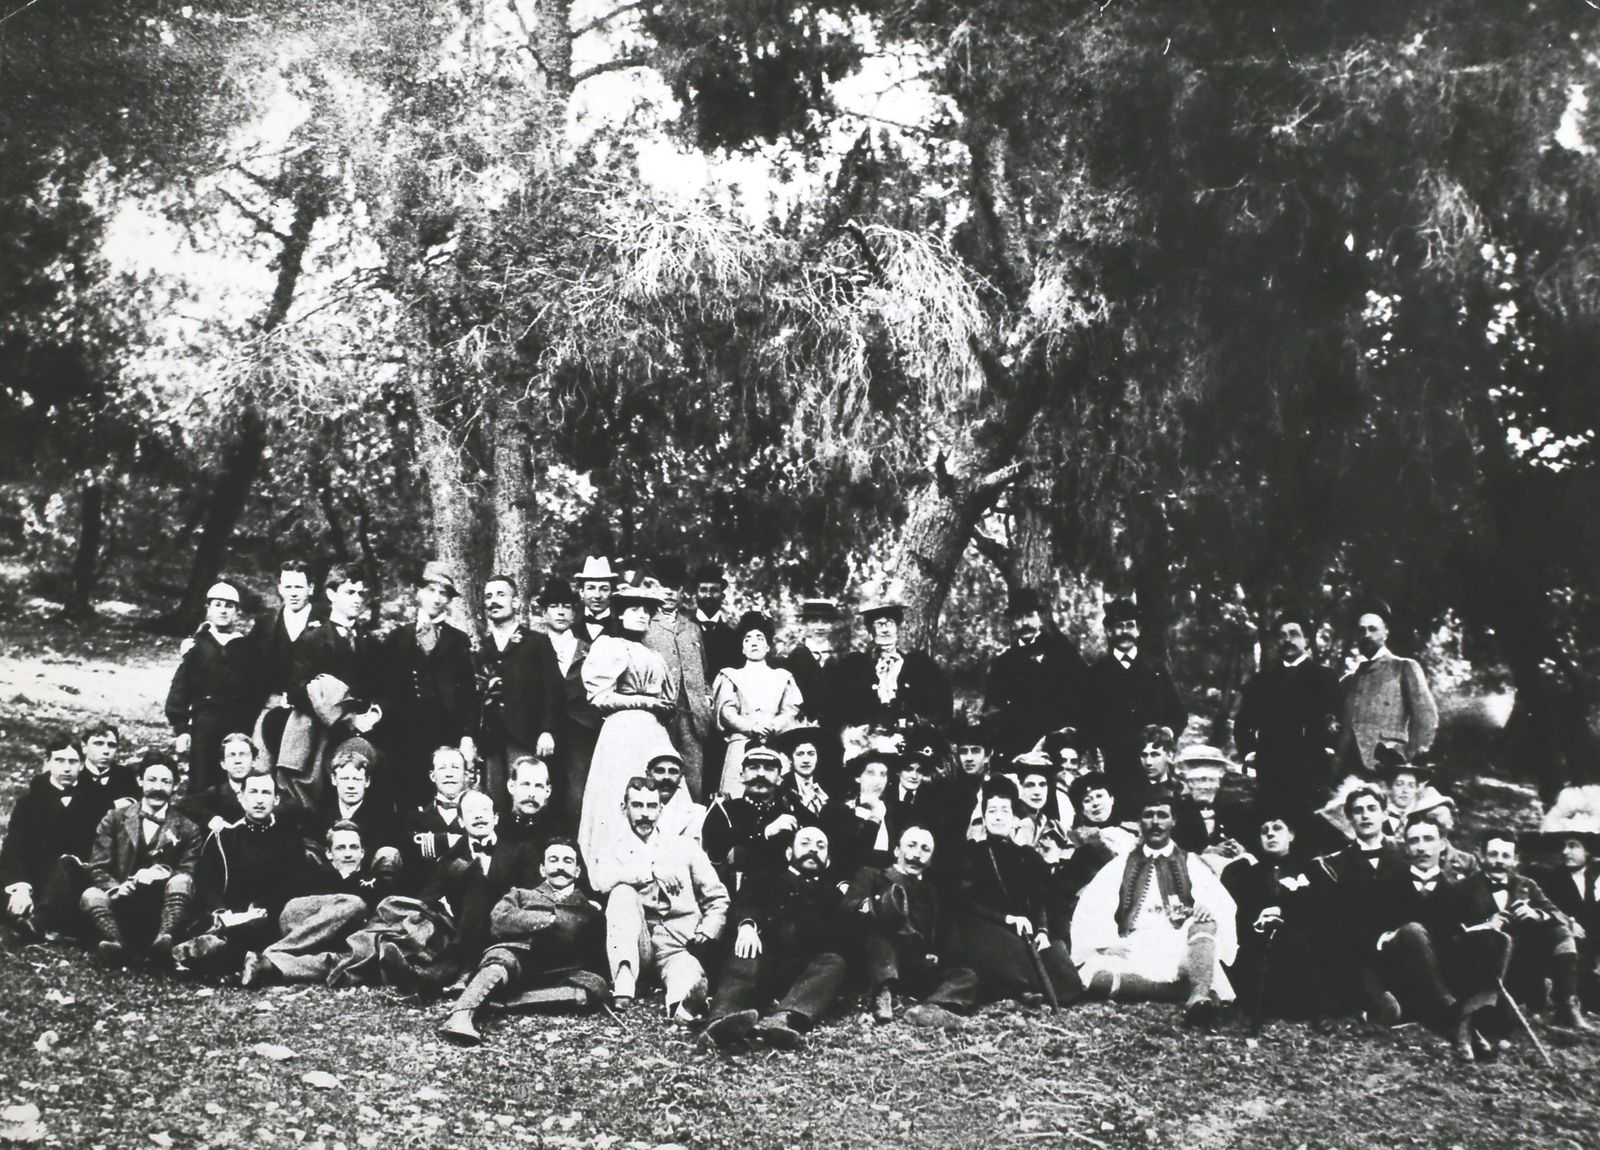 Athens Olympiad 1896